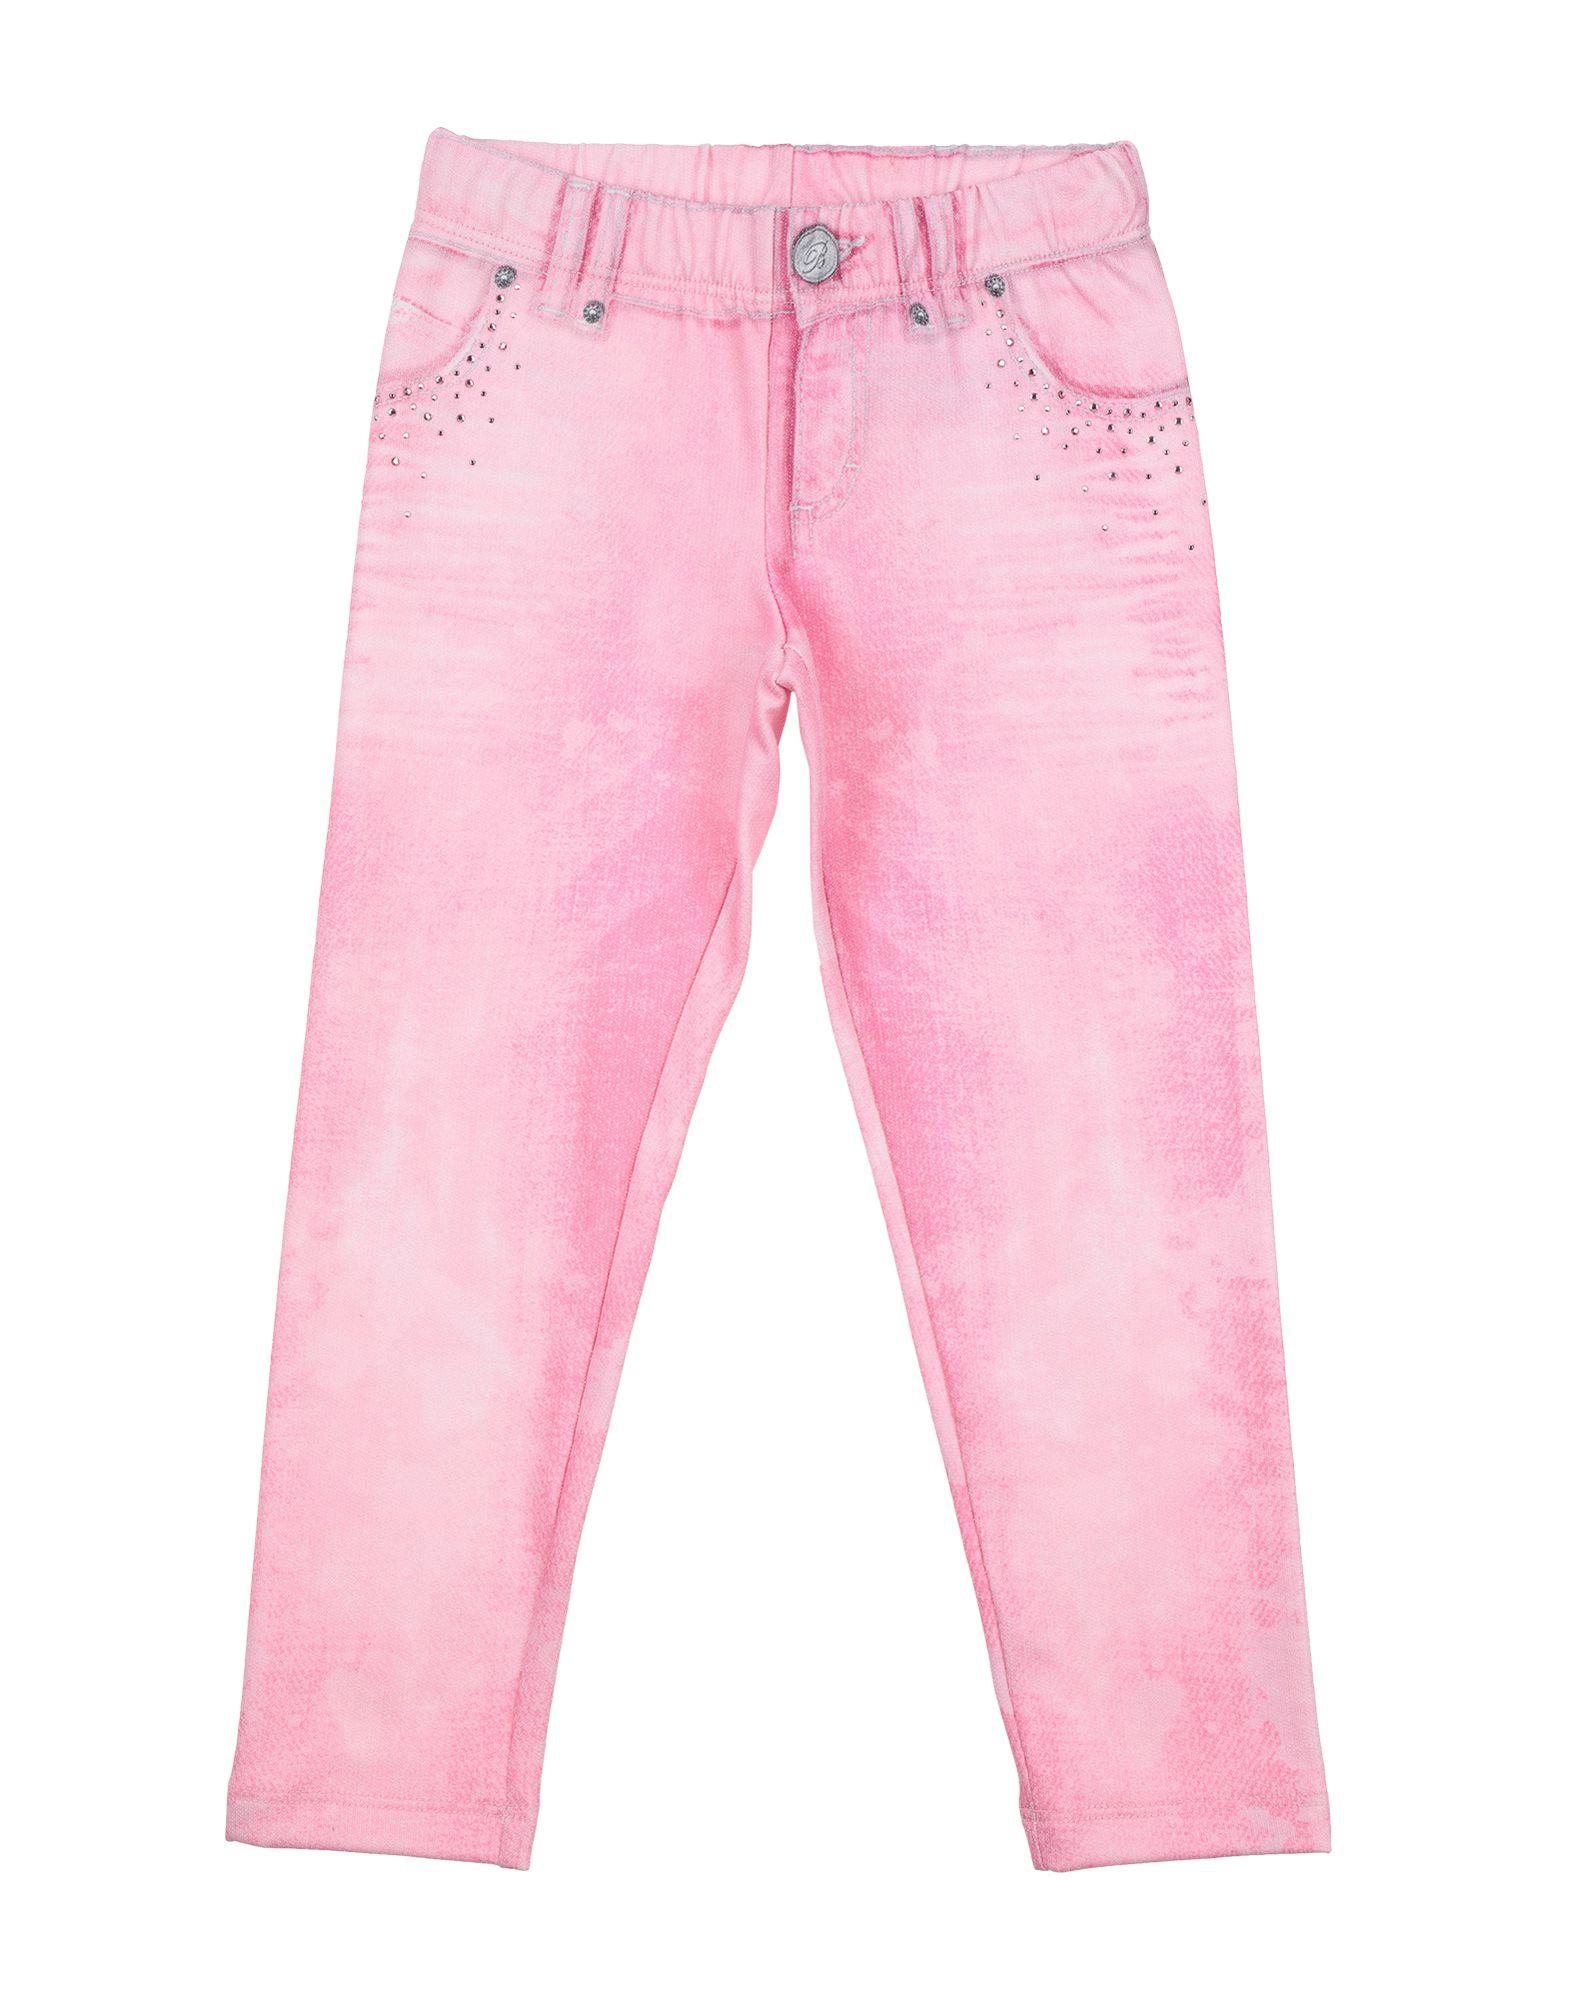 Blumarine Jeans Kids' Casual Pants In Pink